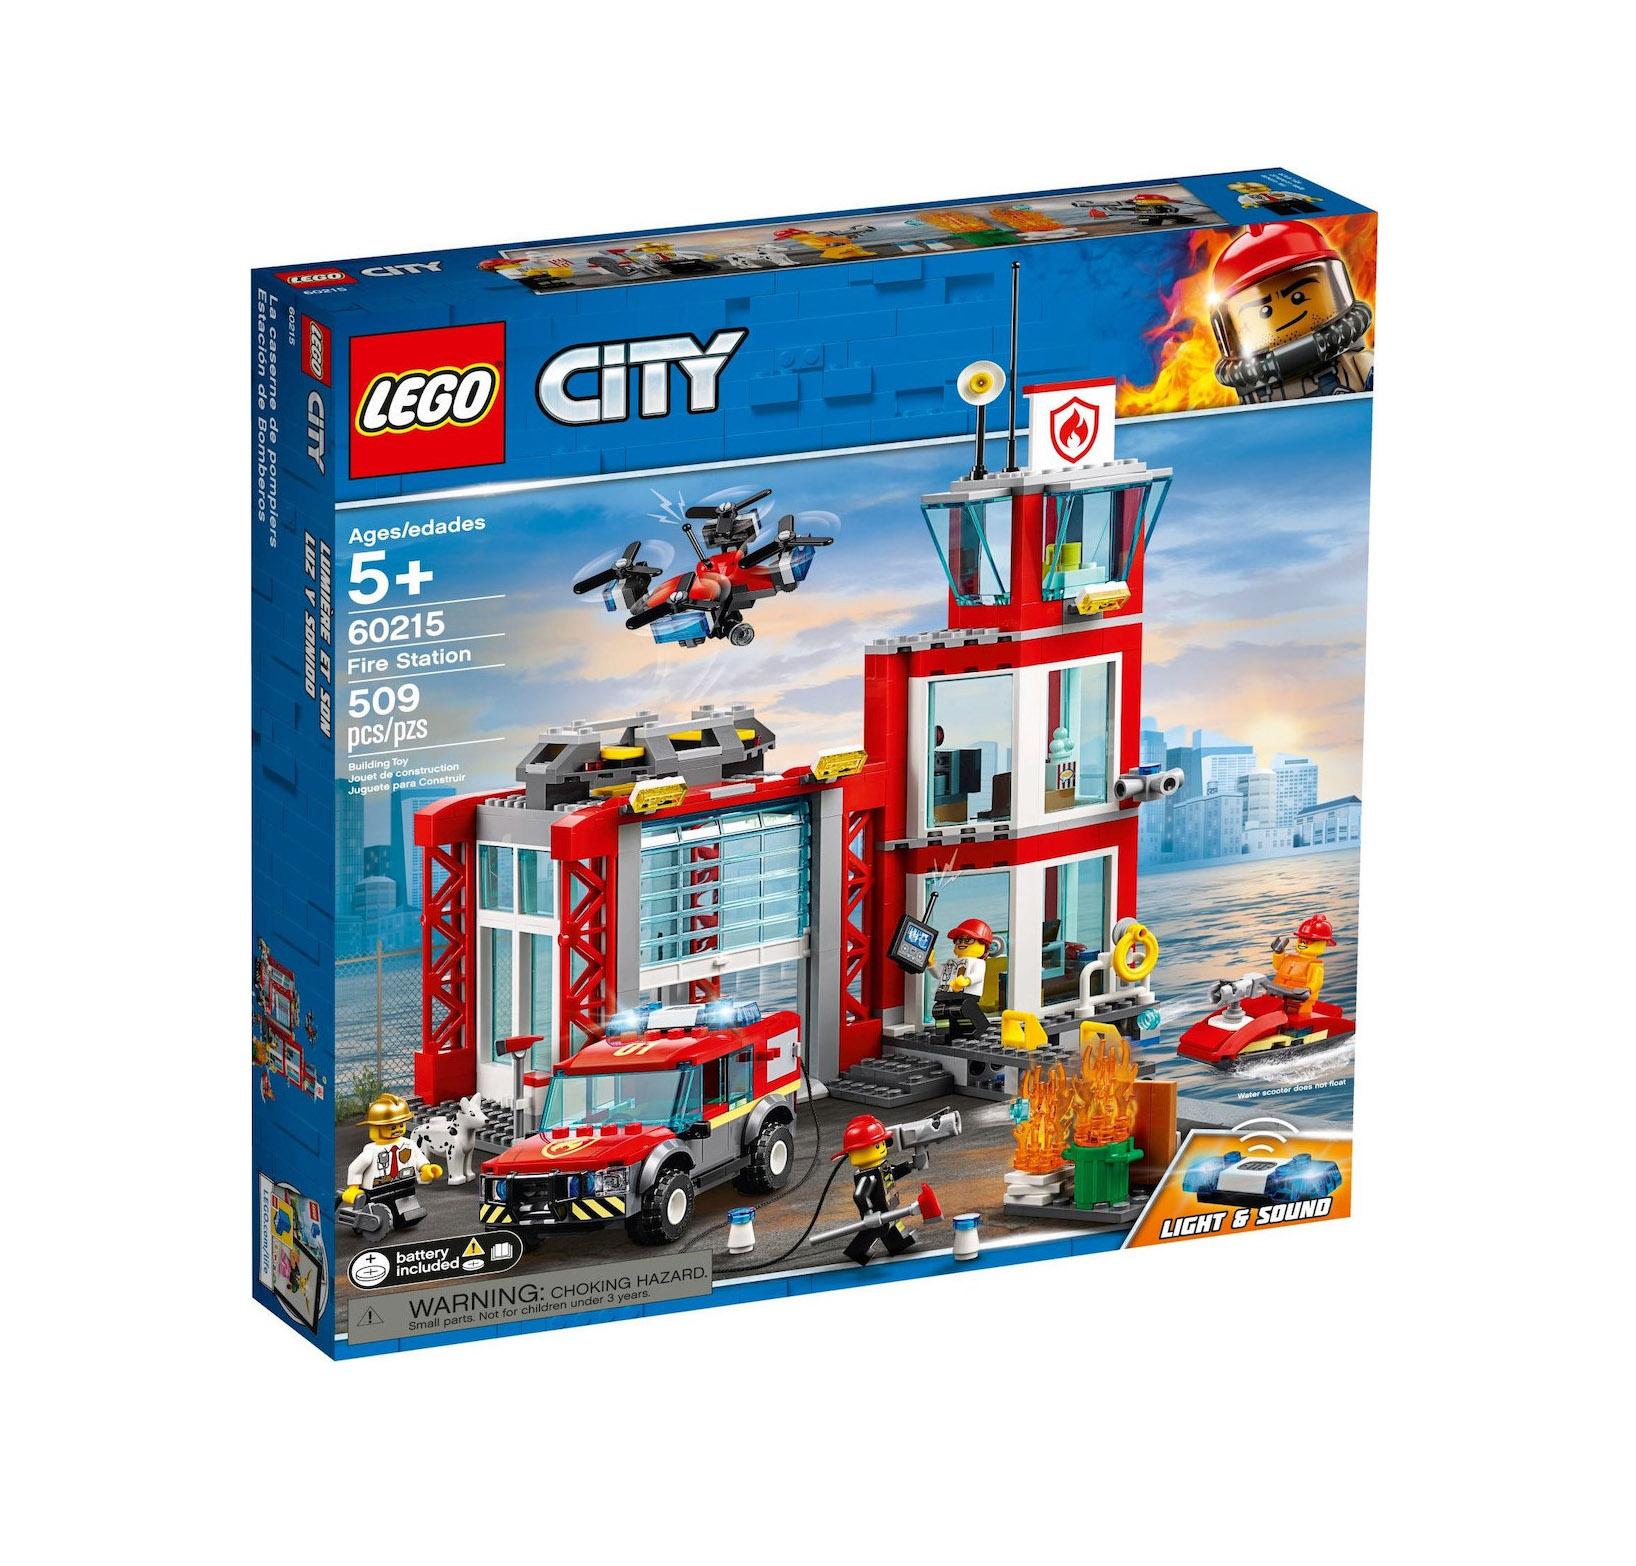 Lego City: Fire Station 60215